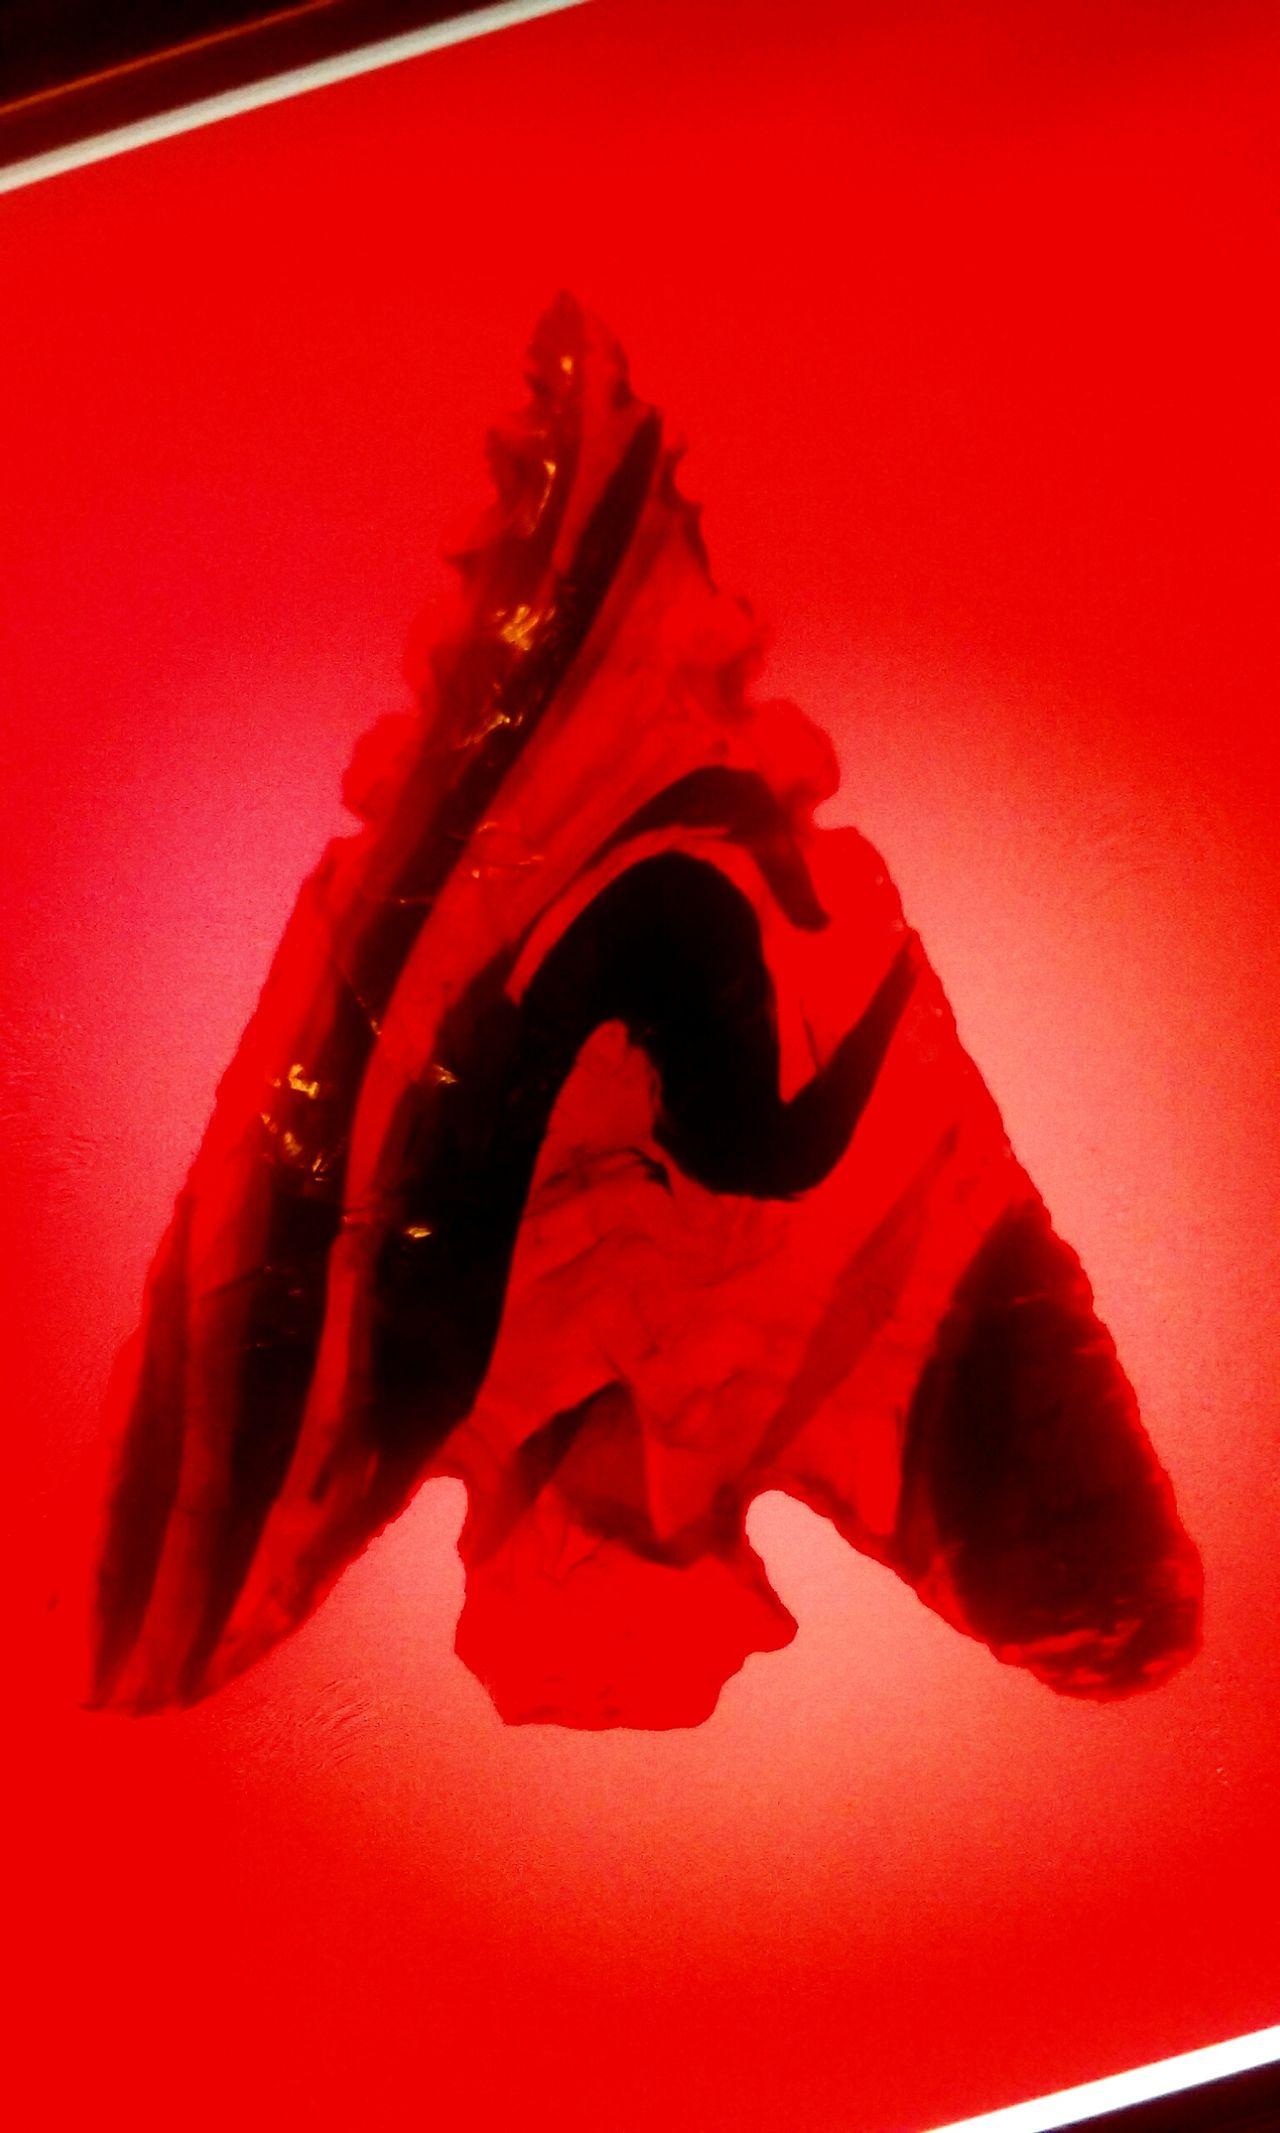 Arrowhead ObsidianLovers Arrowhead Yup Epic Out Of This World Fugazi Tranceparent Specimen